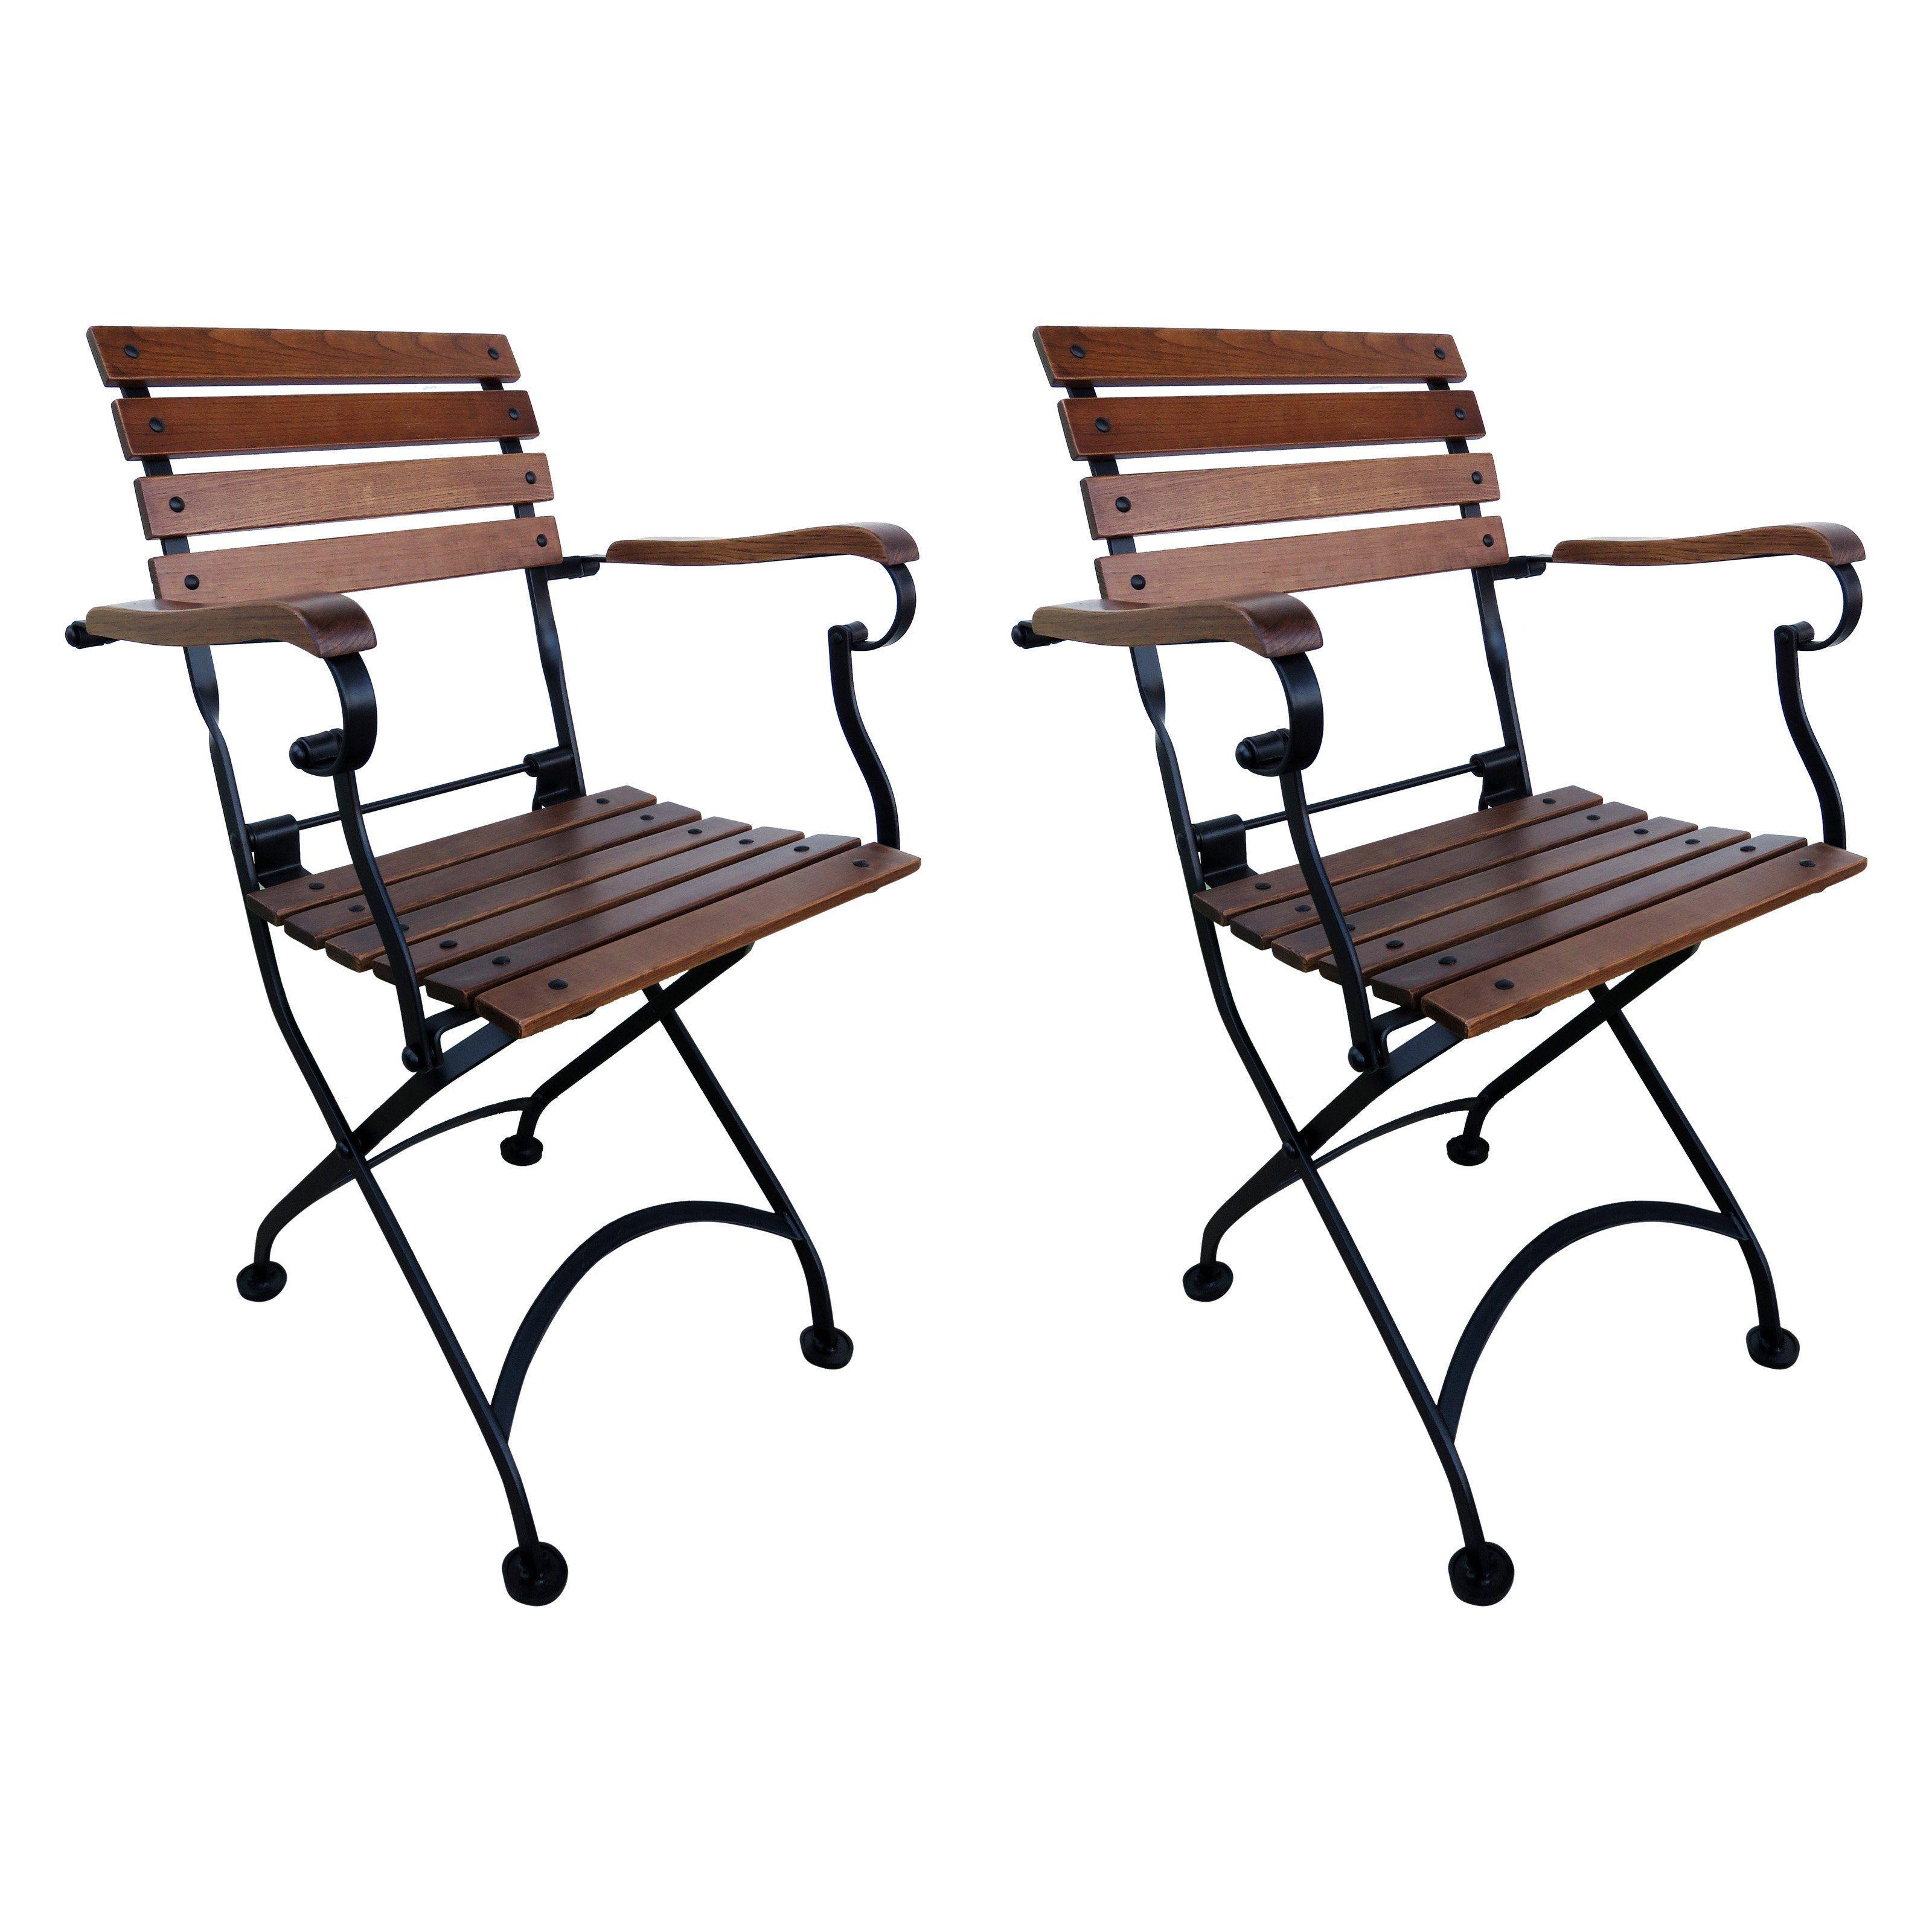 Outdoor Furniture Designhouse French Cafe Bistro Chestnut Wood